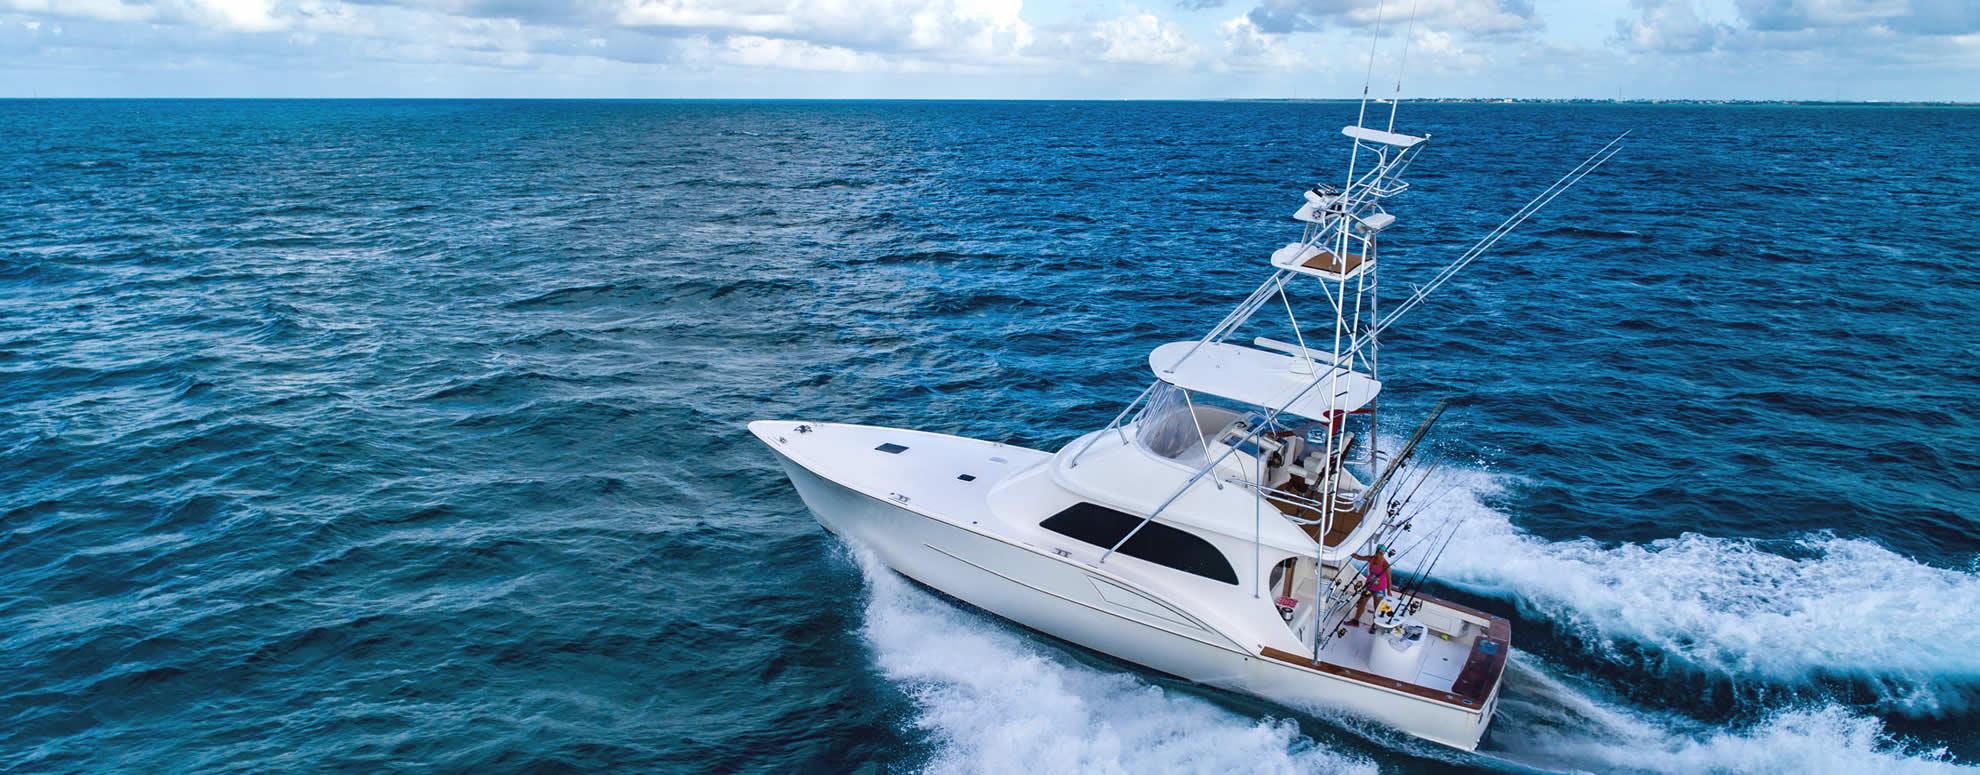 Florida Keys Charter Fishing Rates